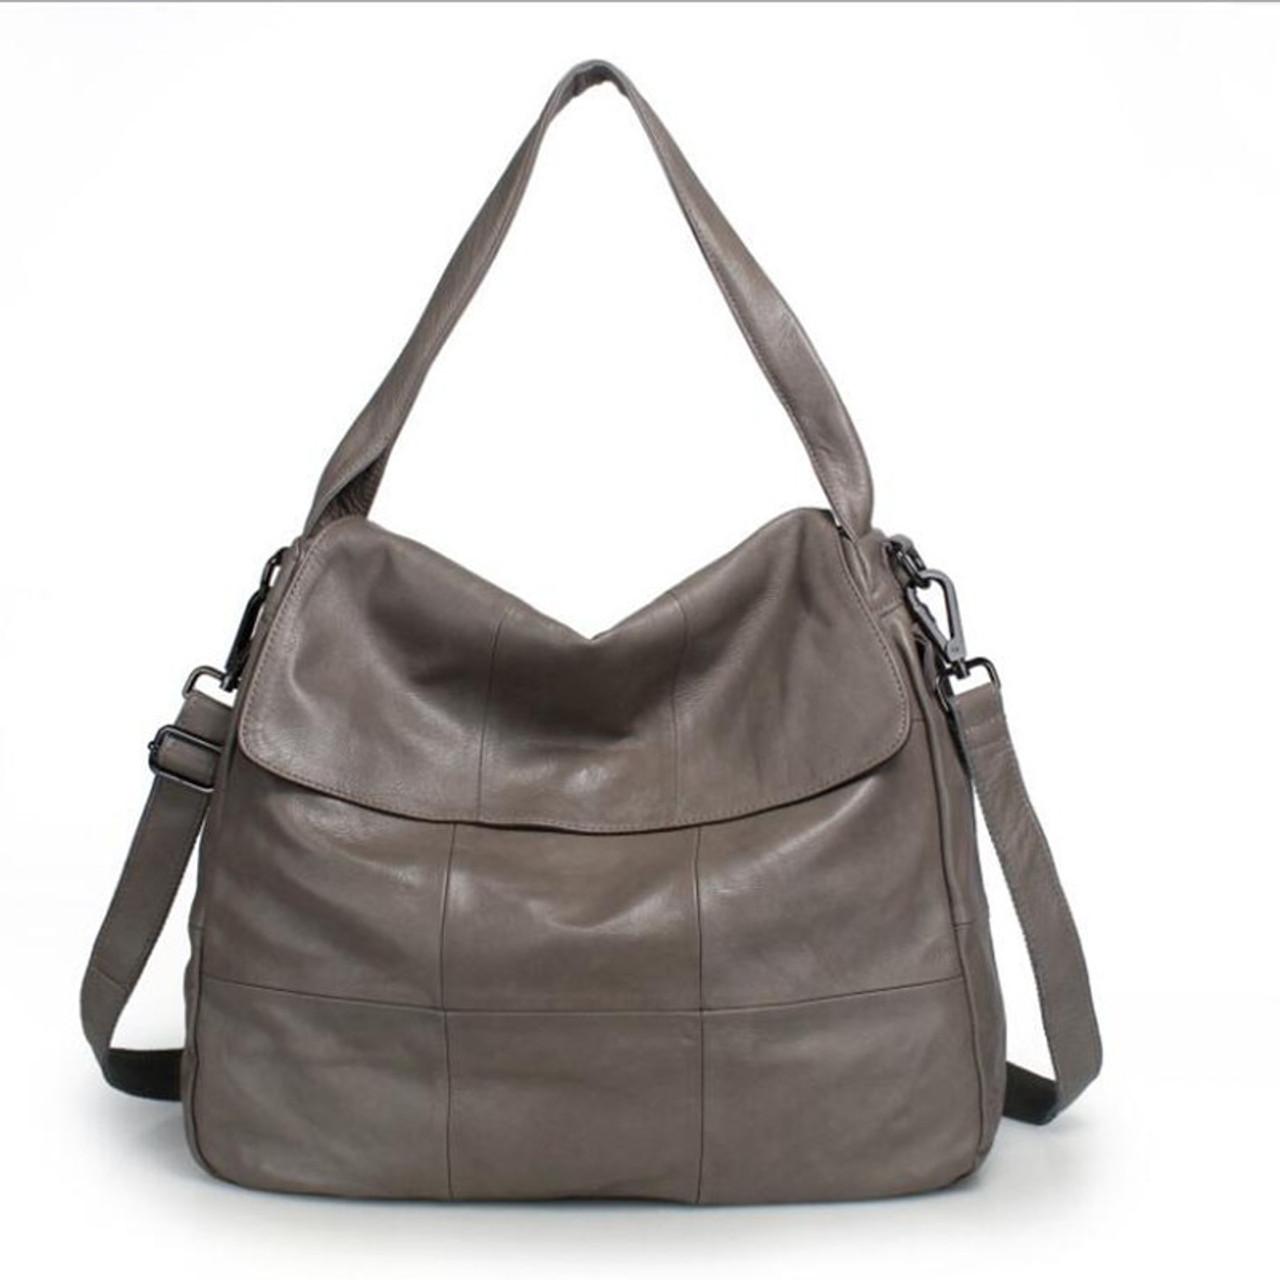 50742adc21e Women Genuine Leather Handbags Women Soft Messenger Bags Designer Crossbody  Bag Women Big Tote Bag Ladies Vintage Shoulder Bag